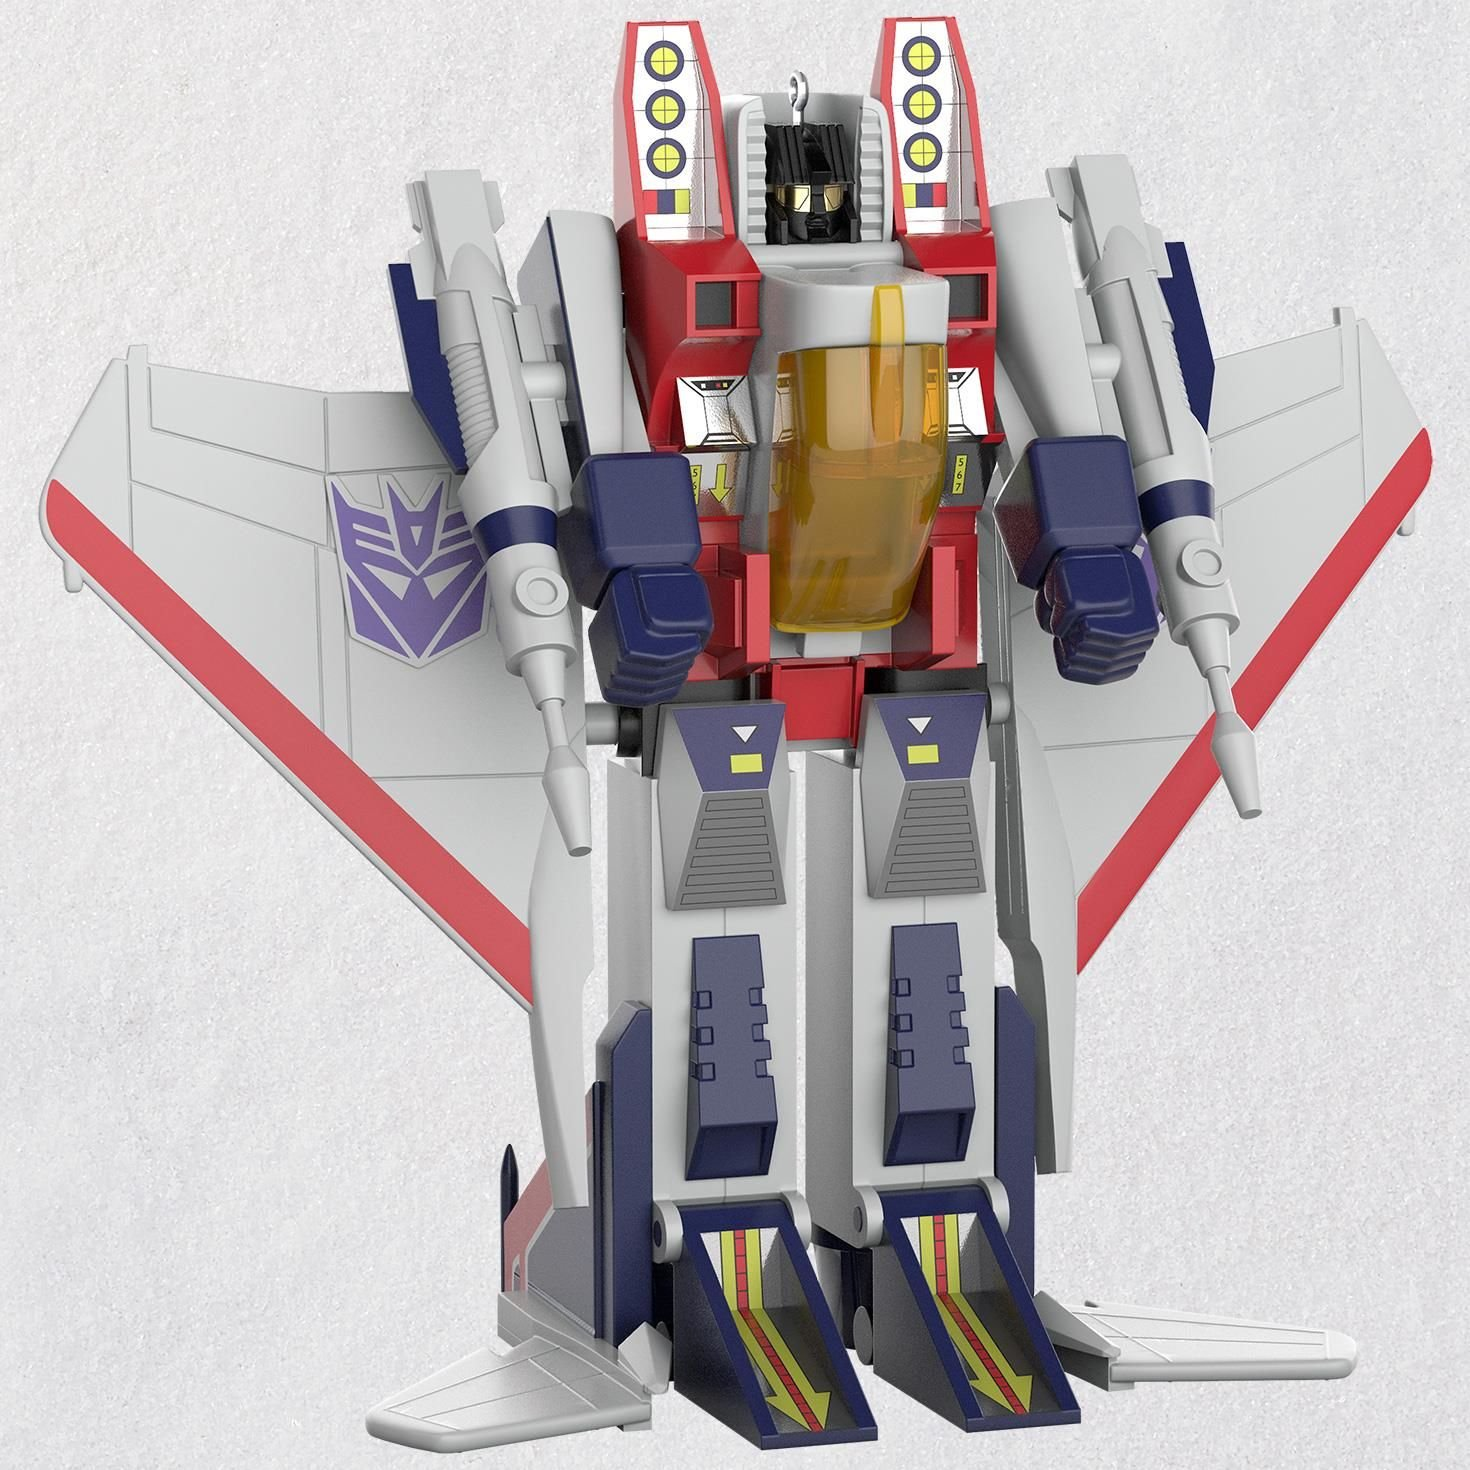 Hallmark Transformers Starscream Ornament keepsake-ornaments Toys & Gaming